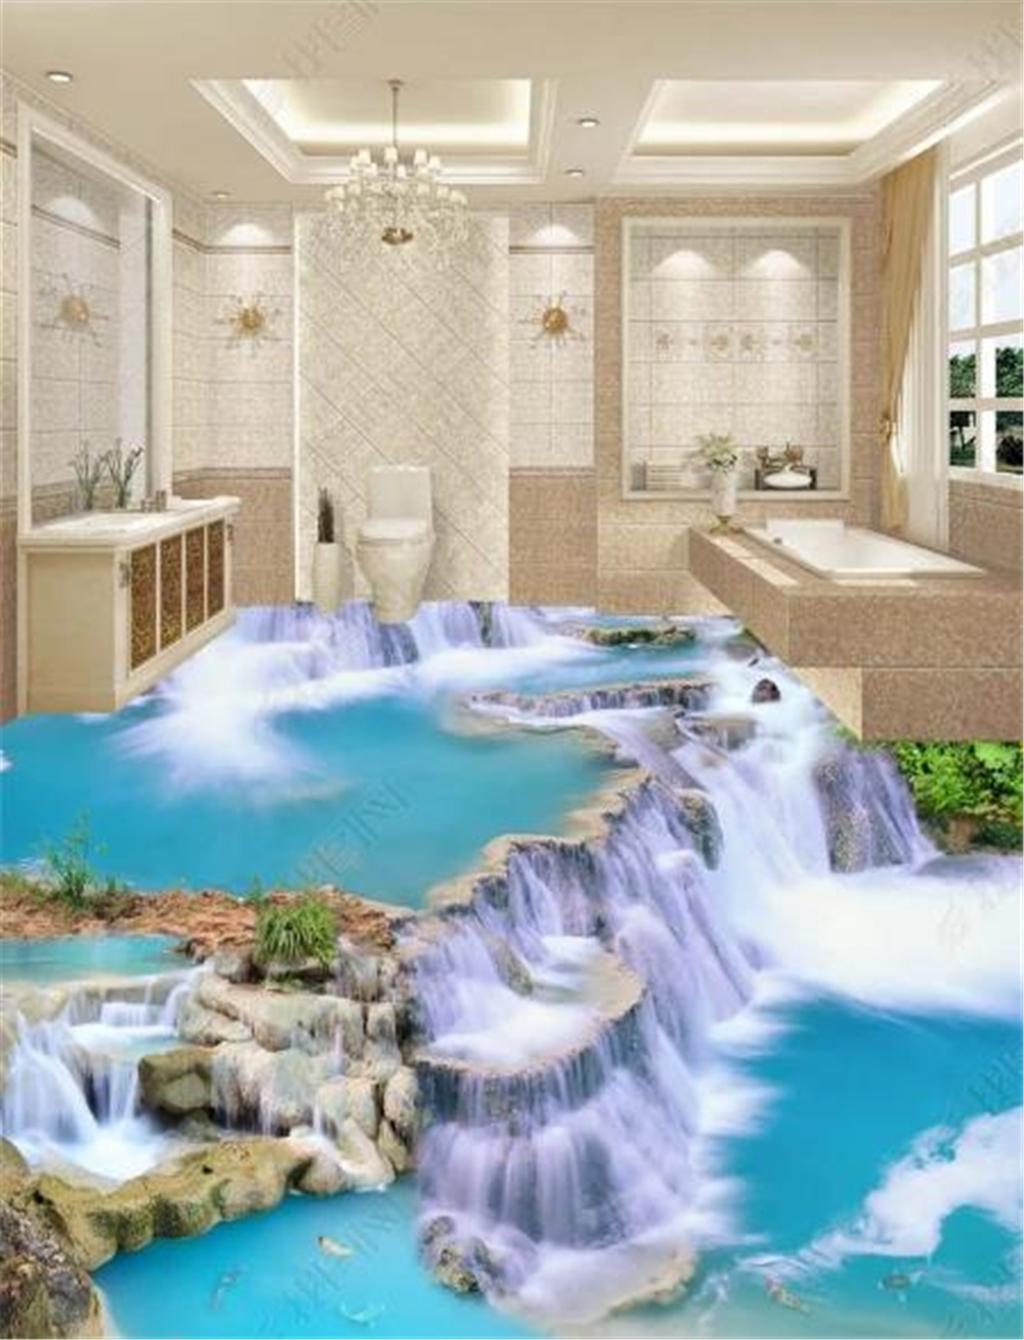 3d wallpaper das paradies wasserfall in der welt 3d wohnzimmer schlafzimmer boden mural wallpaper